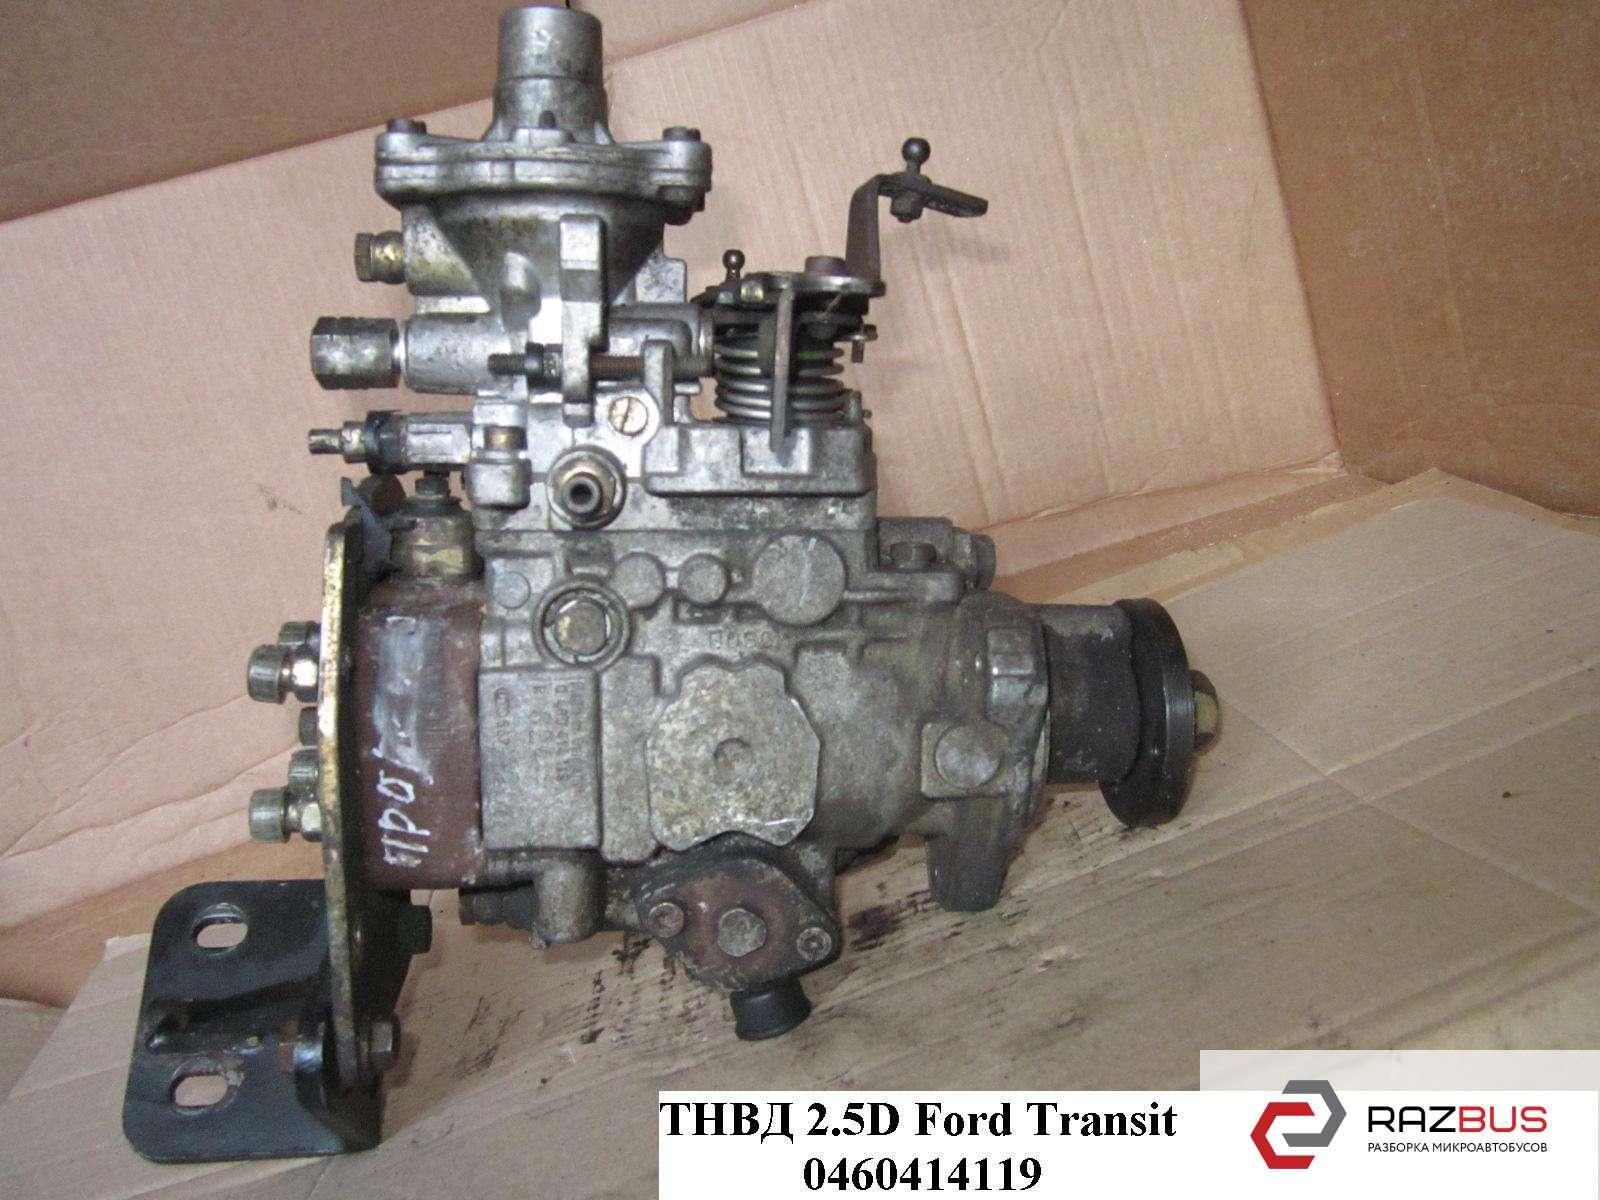 0460414119 ТНВД 2.5D FORD TRANSIT 1985-2000г